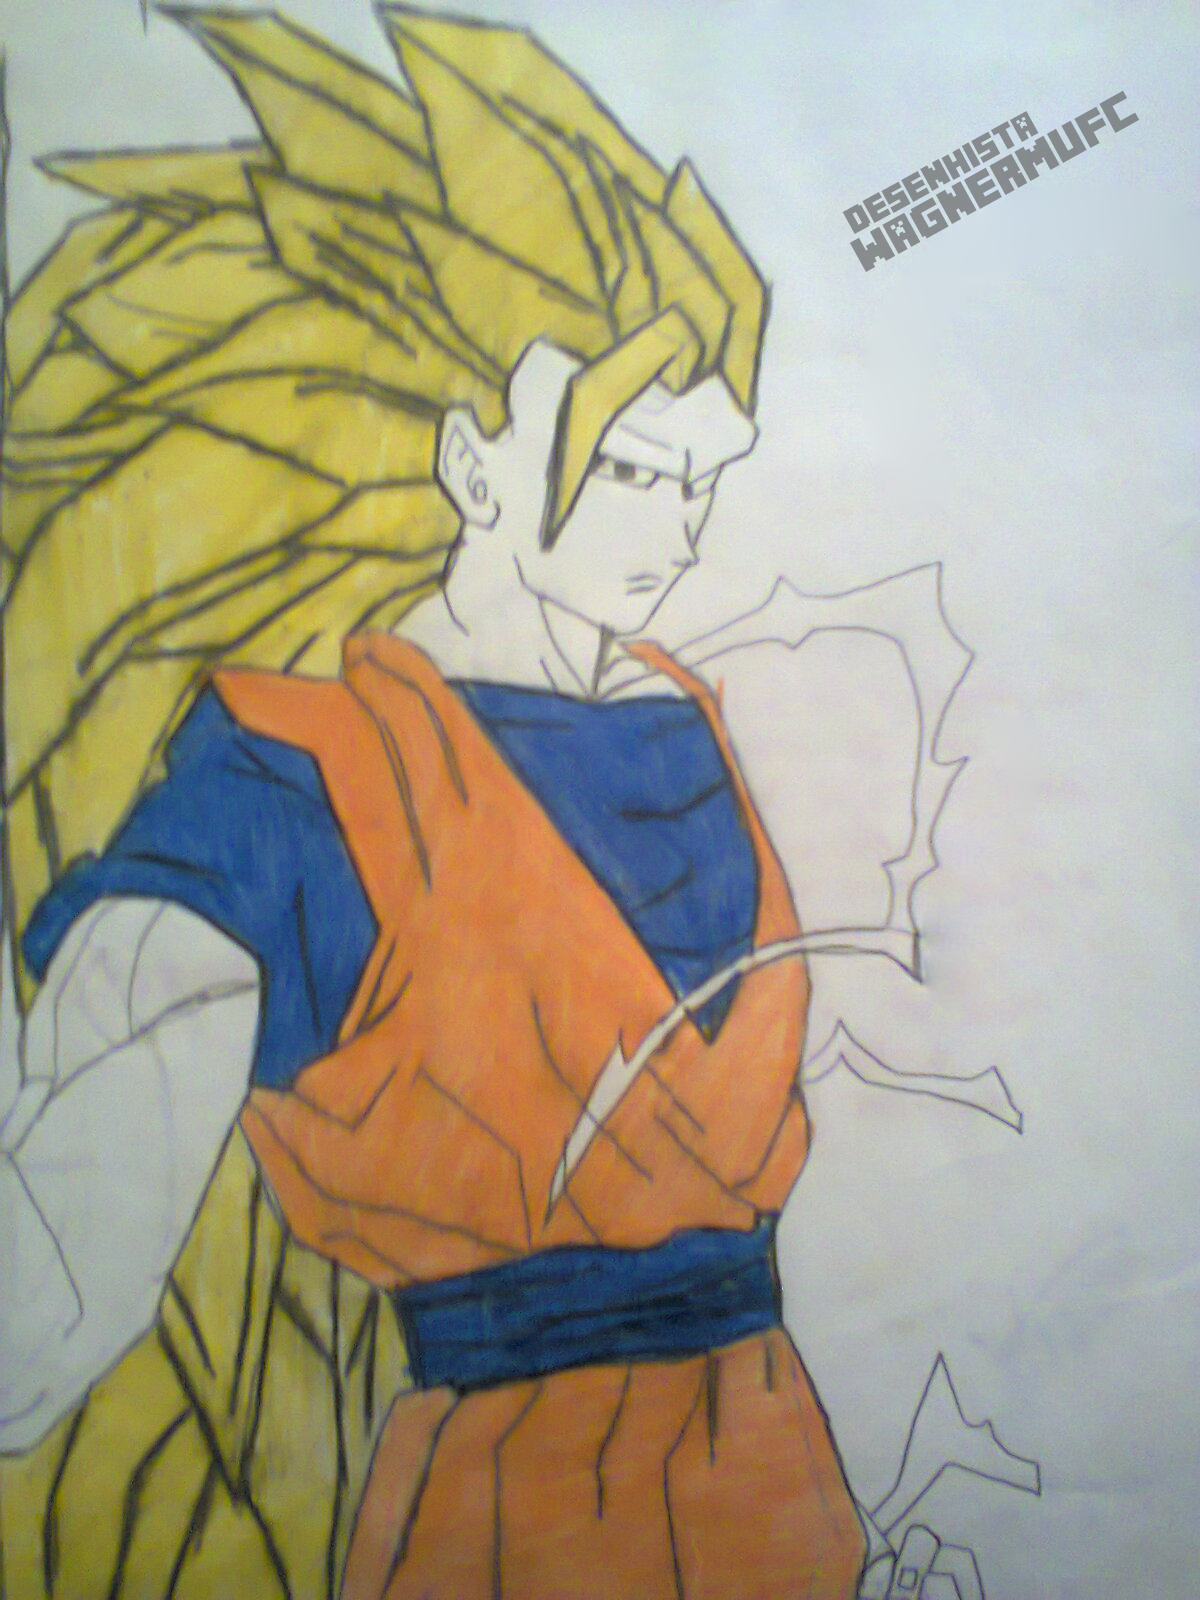 Goku Super Sayajin 3 Dragon Ball Z Desenho By Wagnermufc